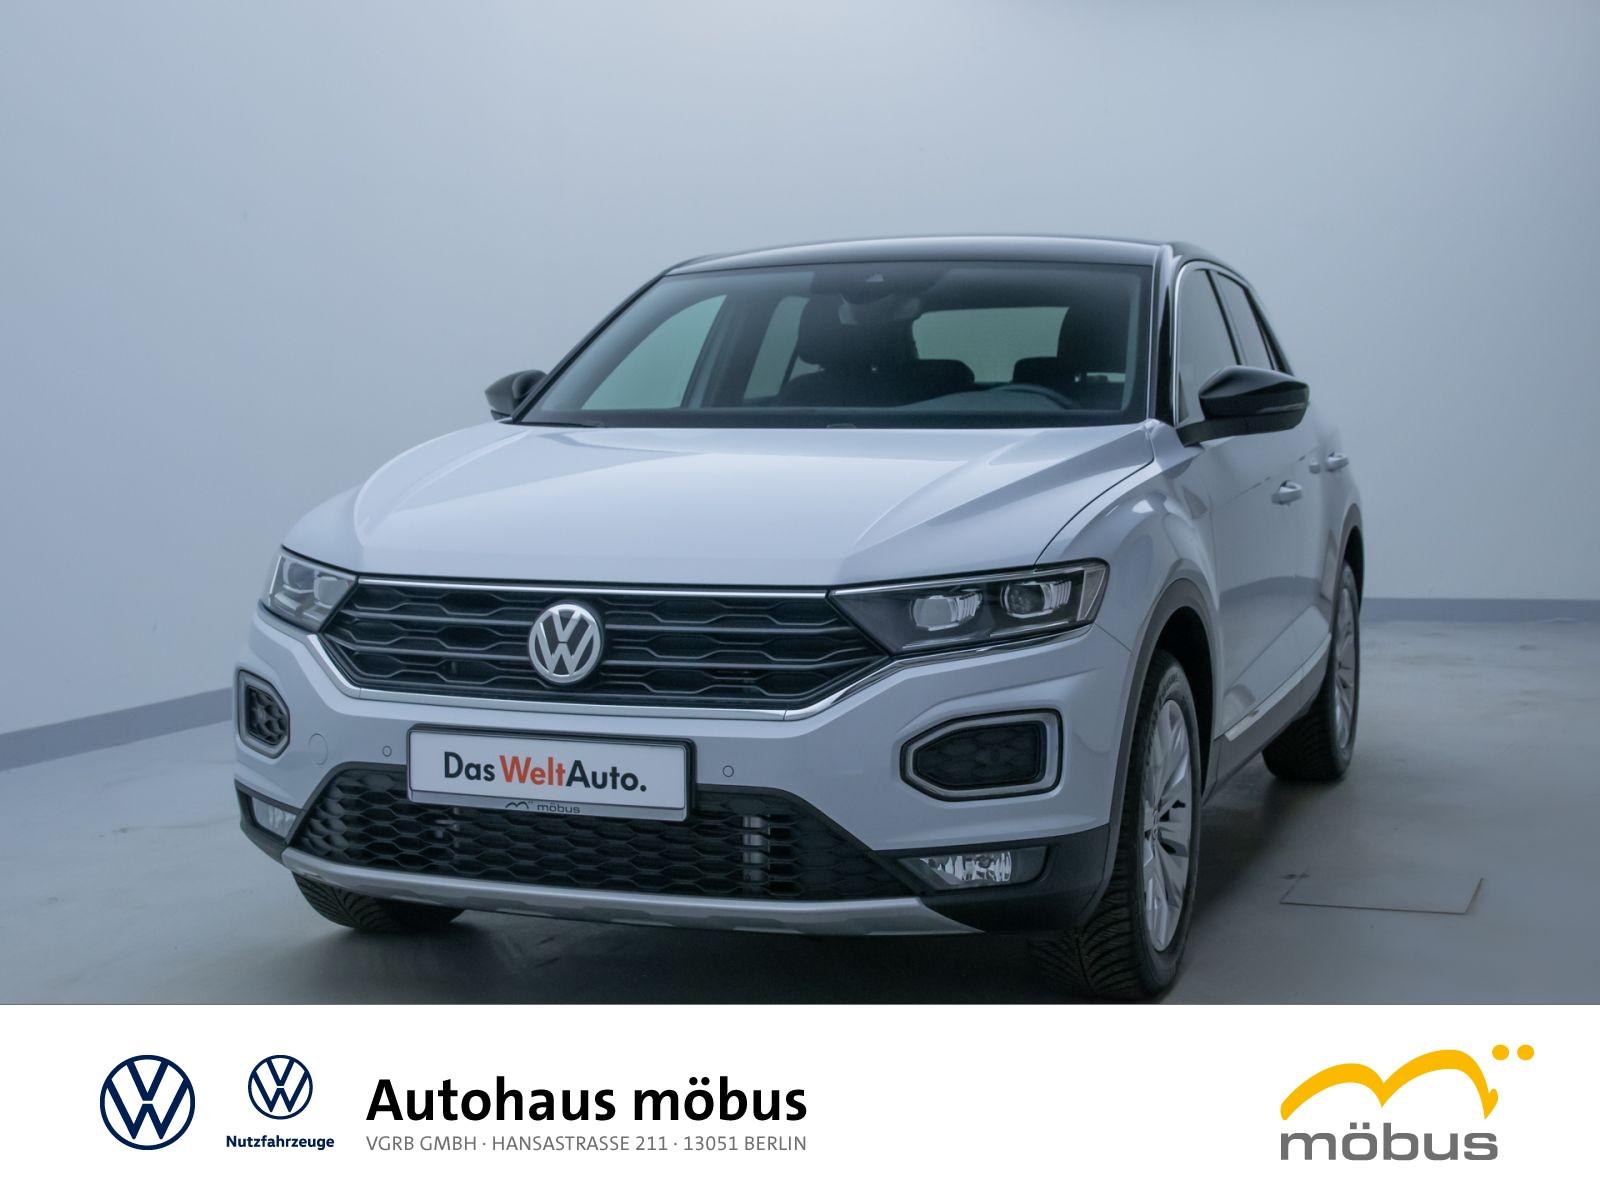 Volkswagen T-Roc 1.5 TSI*SPORT*LED*AHK*AID*NAVI*APP*USB*PDC, Jahr 2020, Benzin